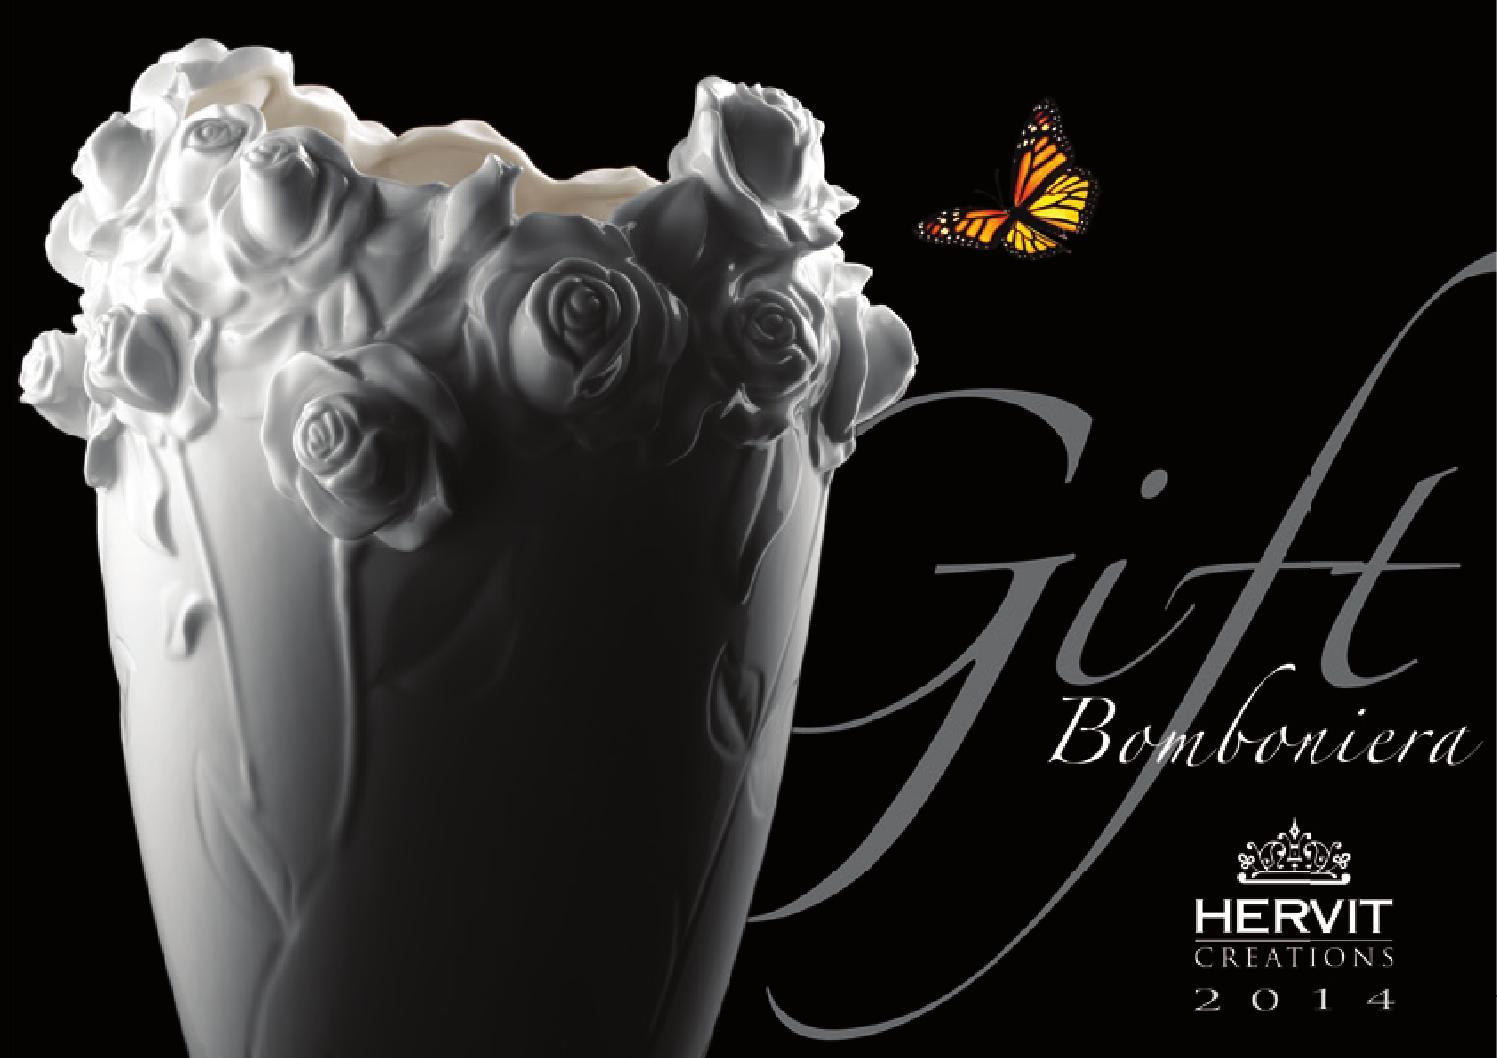 HERVIT - Gift, Bomboniera 2014 by Hervit - issuu